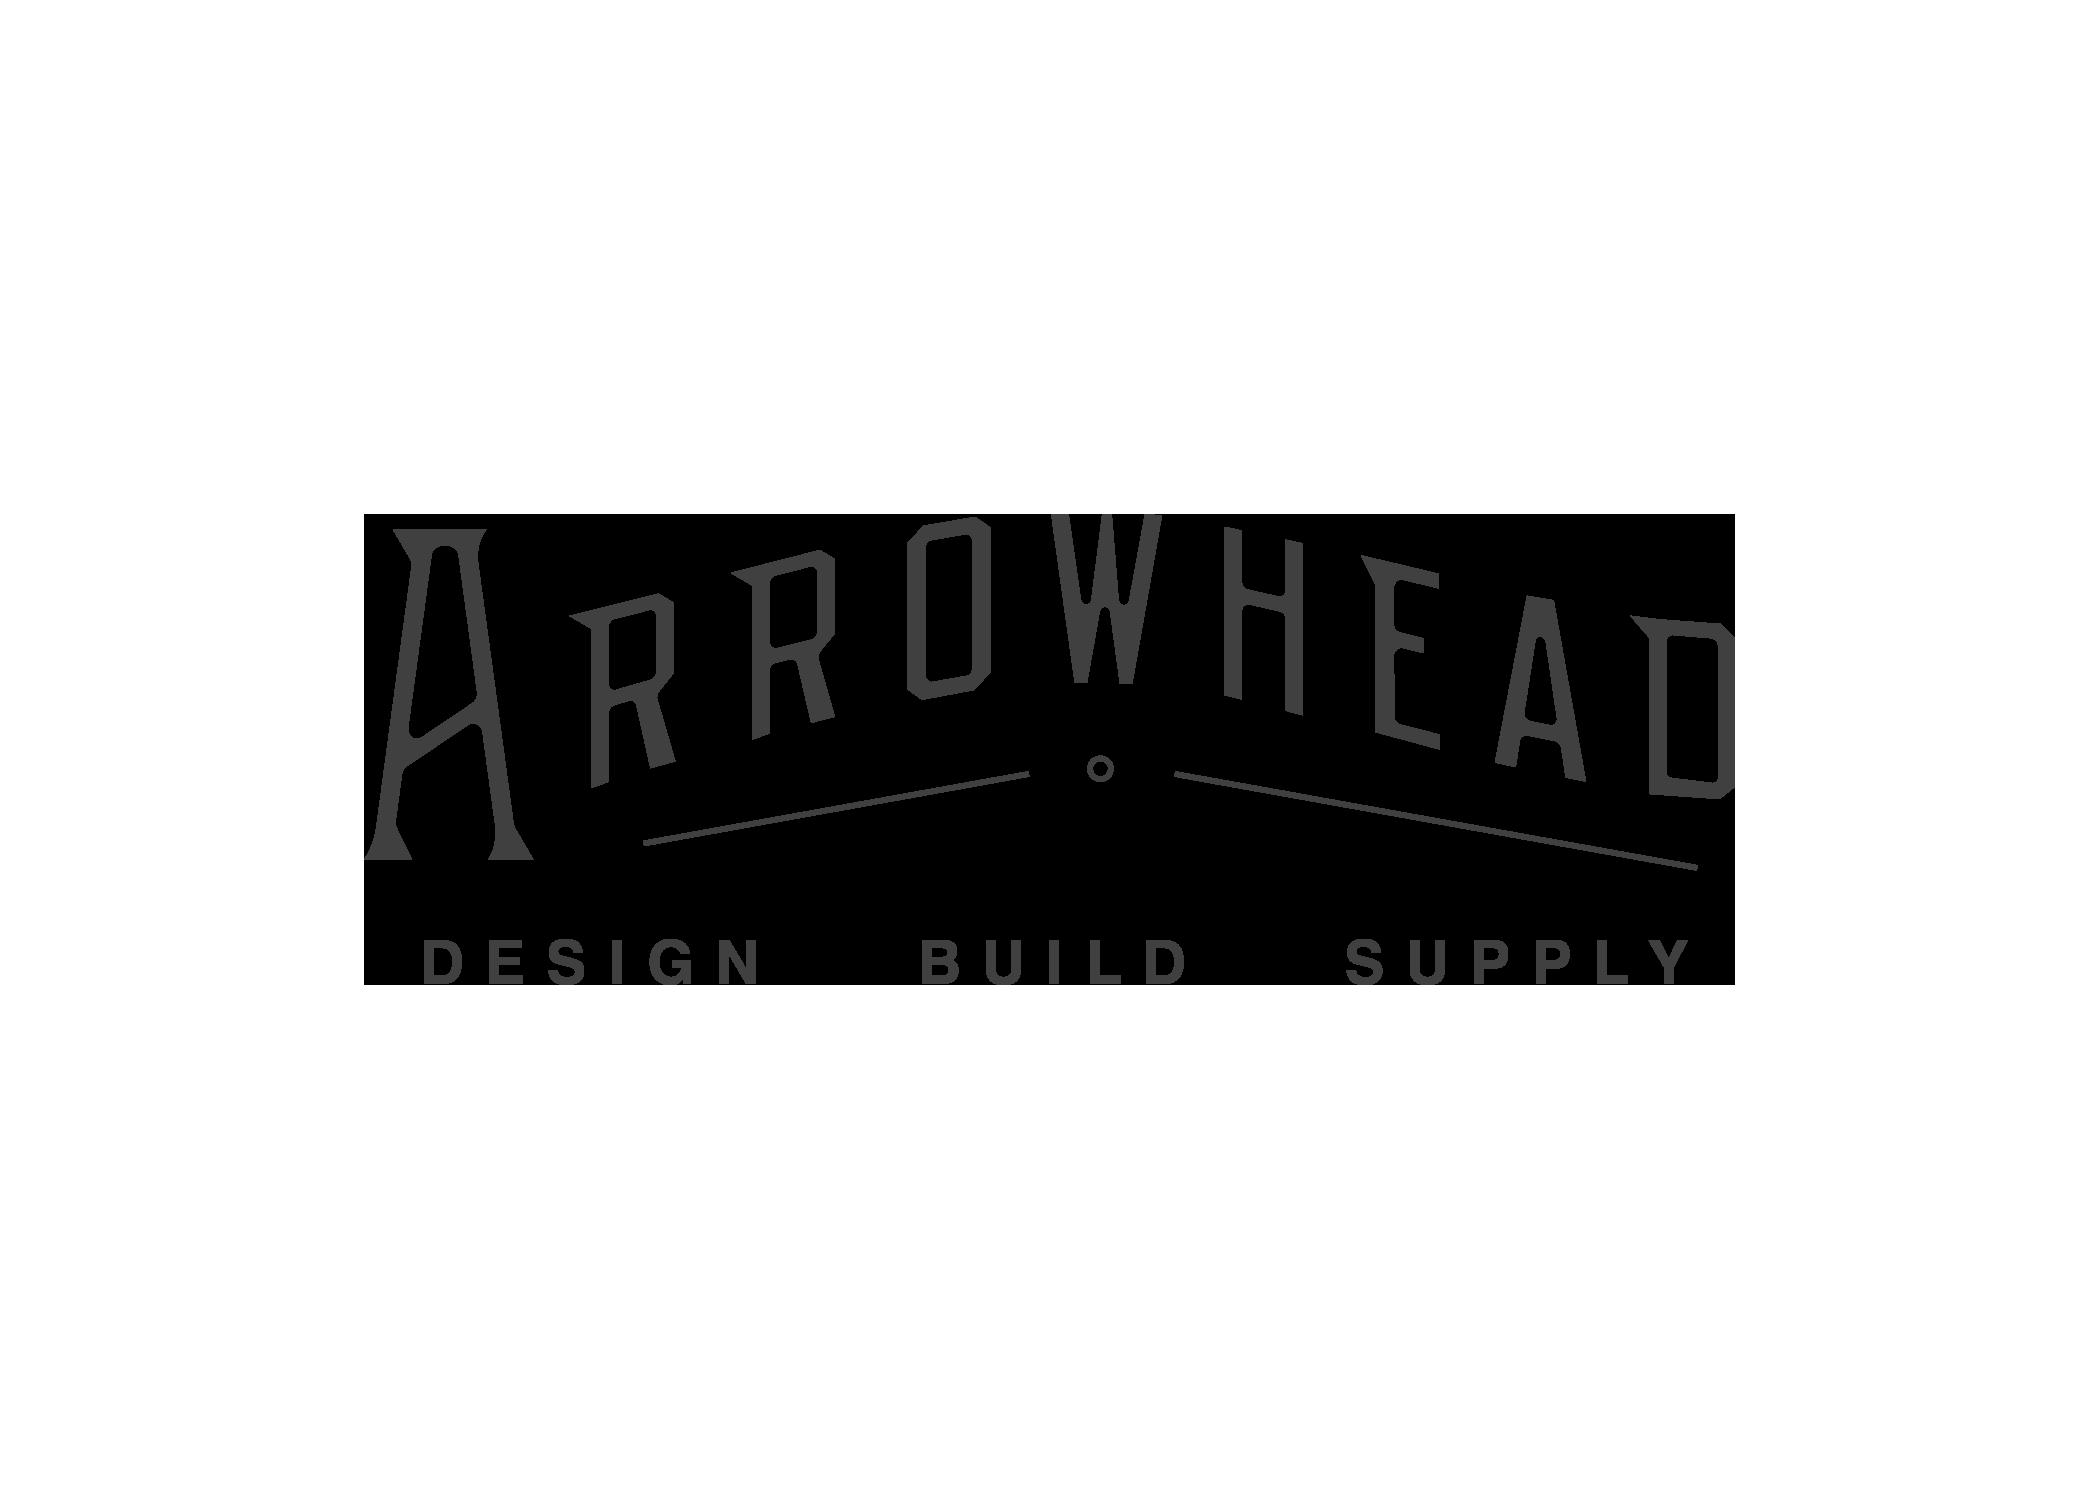 Design by Good South / Arrowhead Logo Design